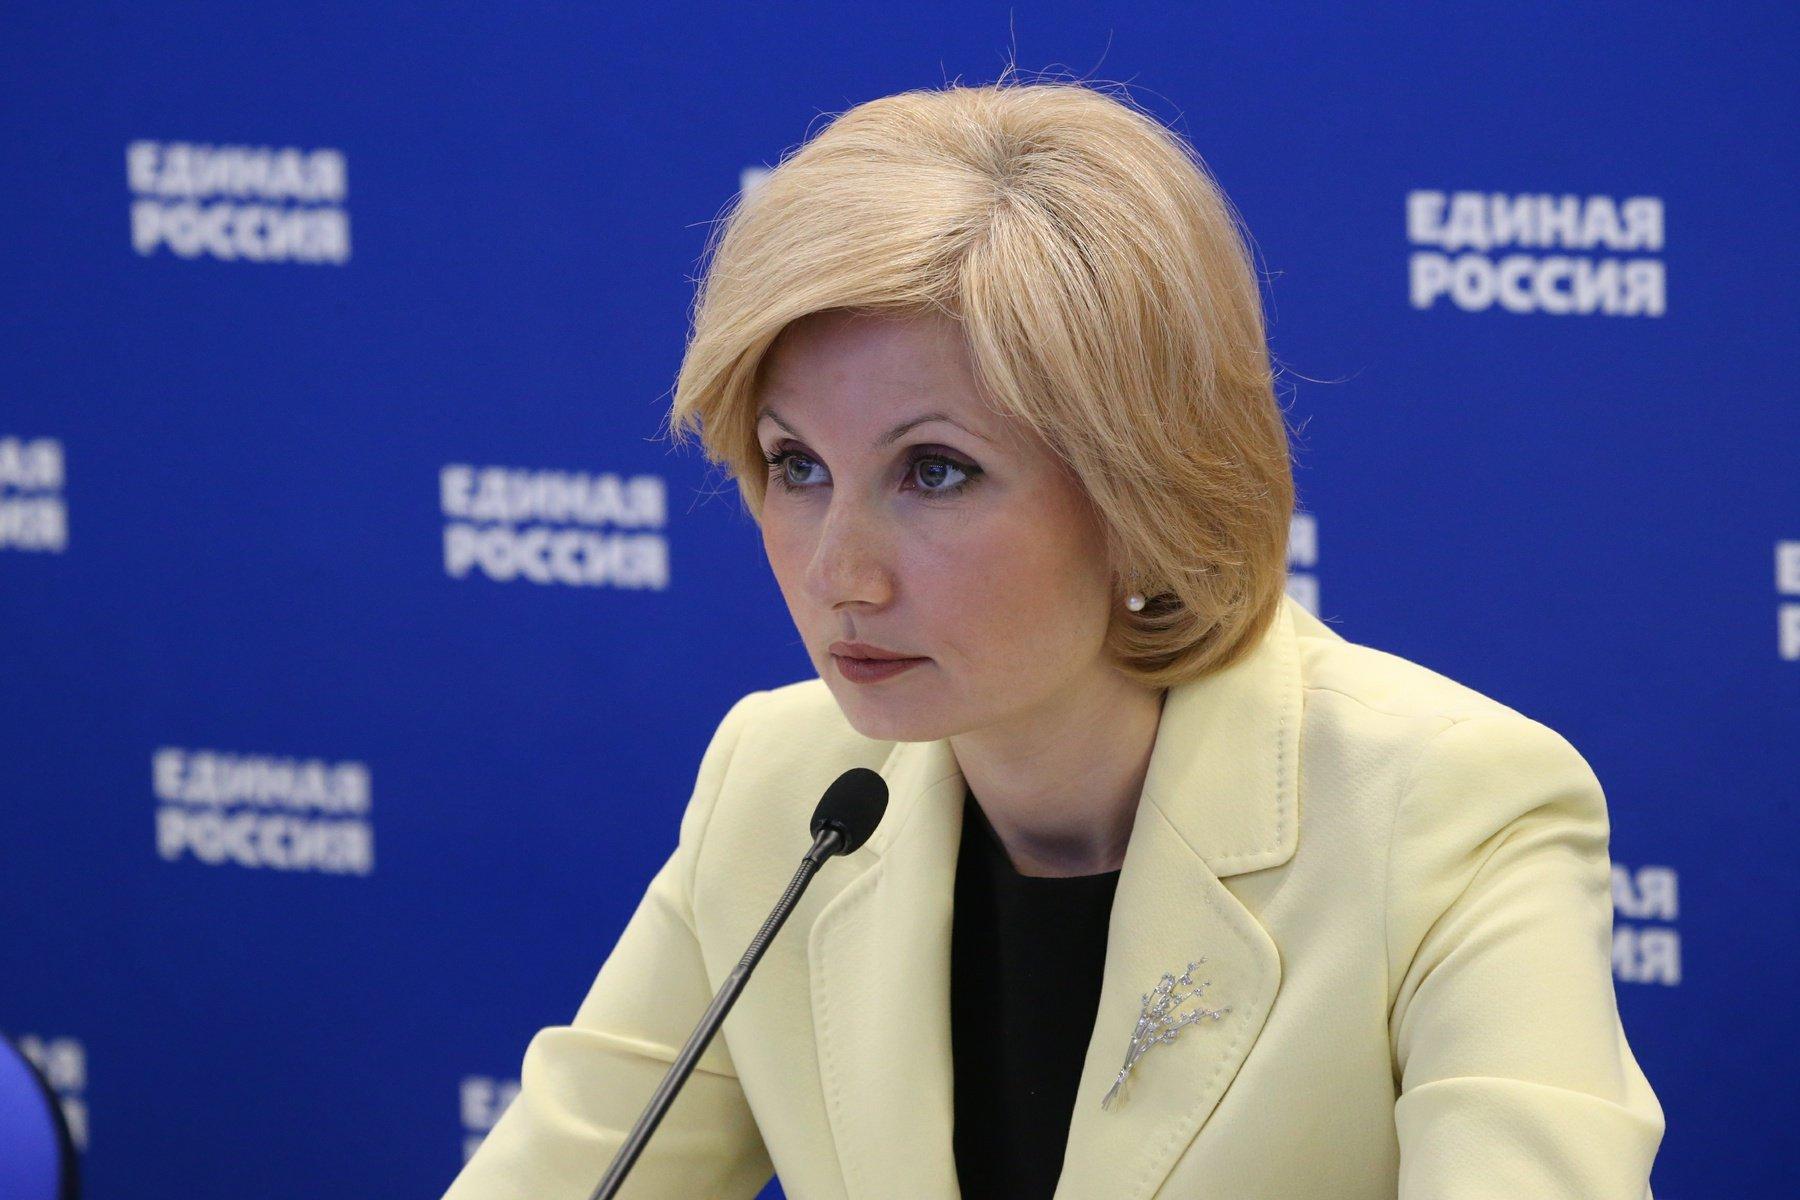 Депутат ольга баталина фото